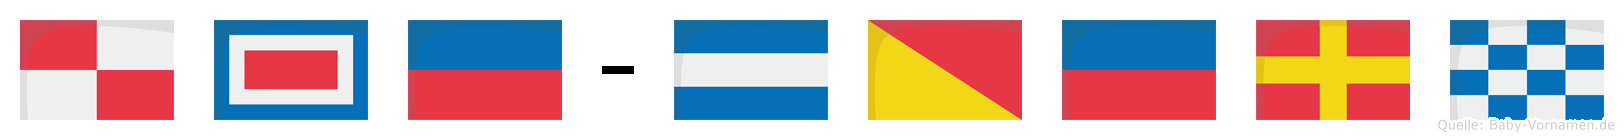 Uwe-Jörn im Flaggenalphabet